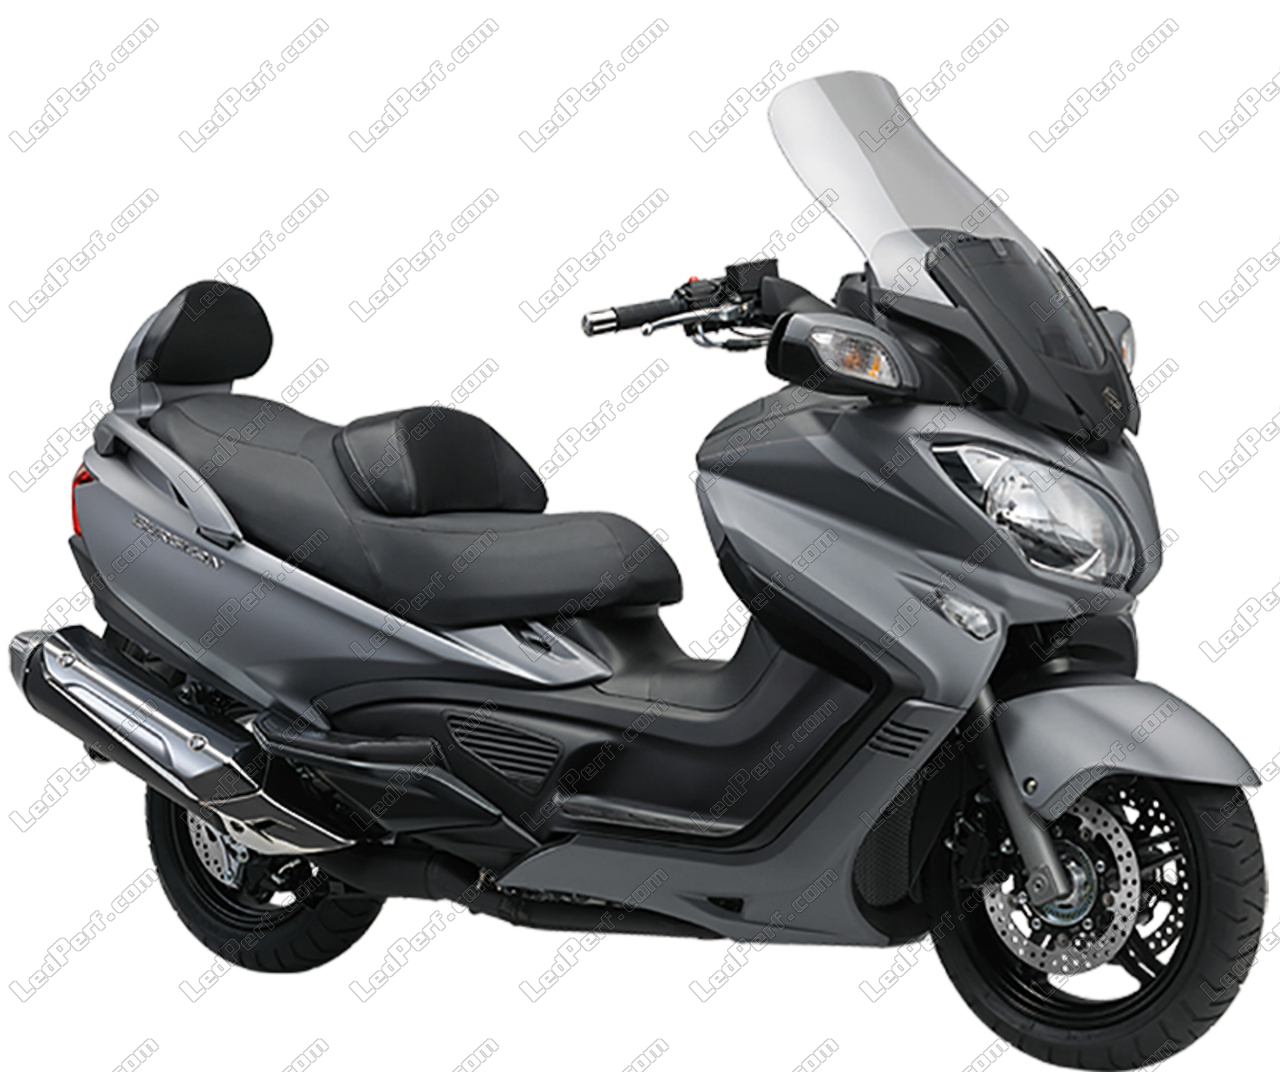 Packs Par Marque Moto Scooter Quad Ssv Spyder Suzuki Burgman 650